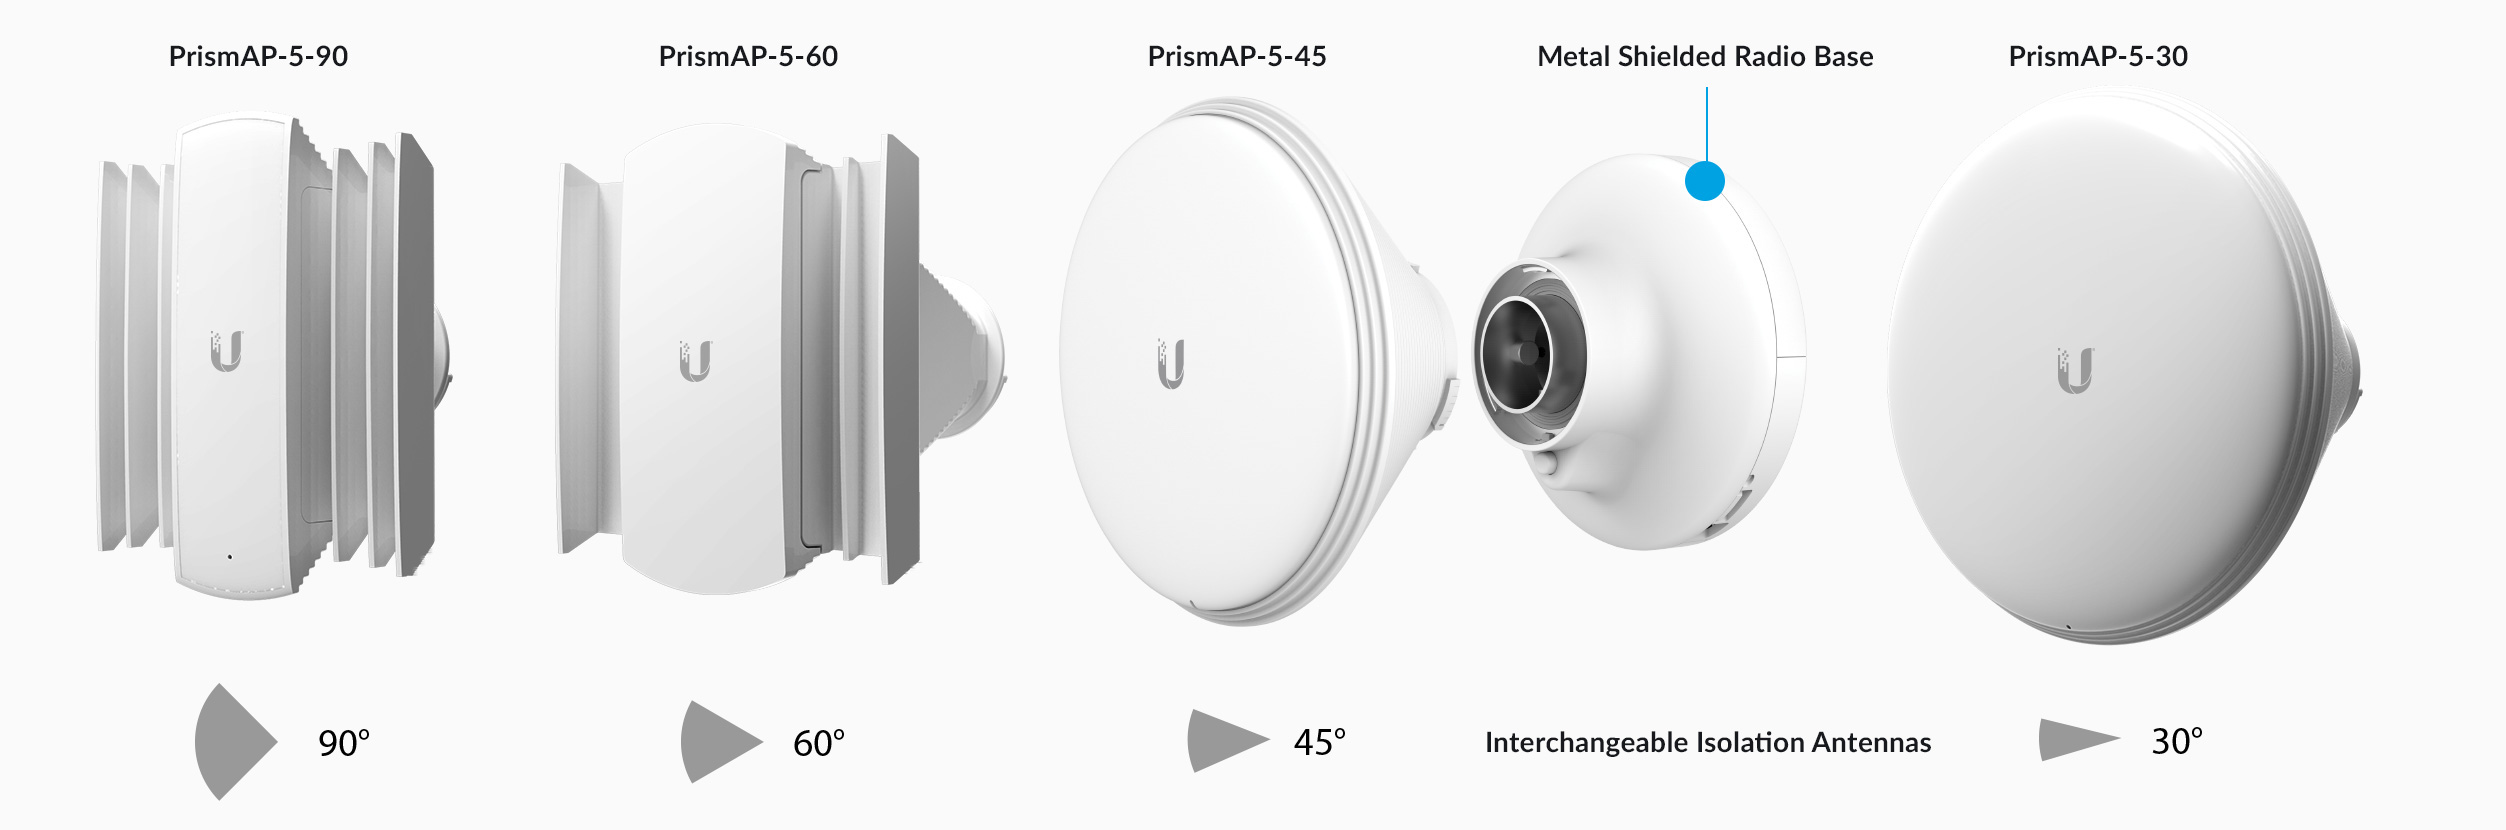 data-interchange=[https://prd-www-cdn.ubnt.com/media/images/product-features/prisms-ap-feature-modular-design1.jpg,